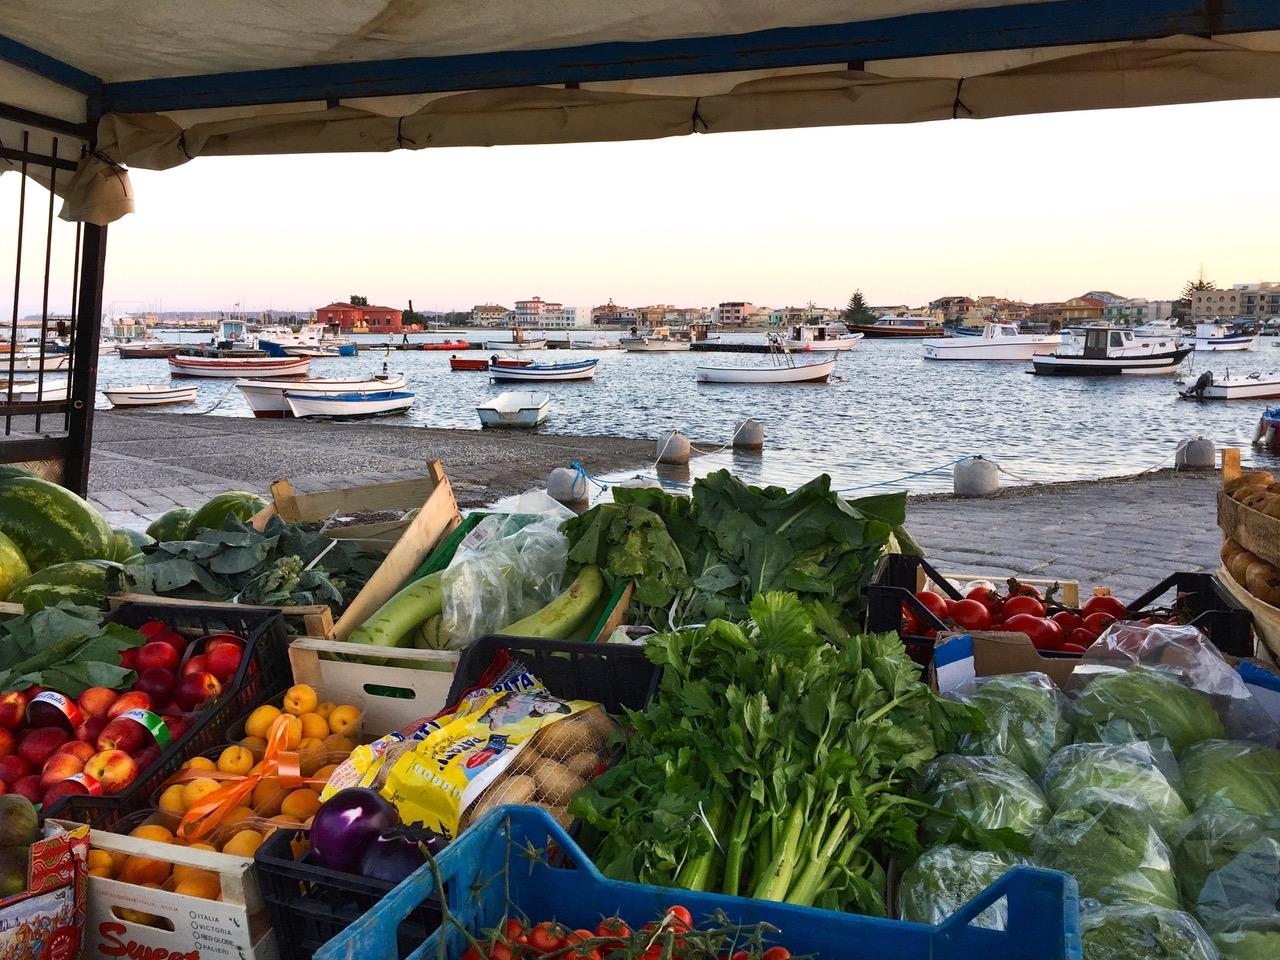 Market in Marzamemi, Sicily